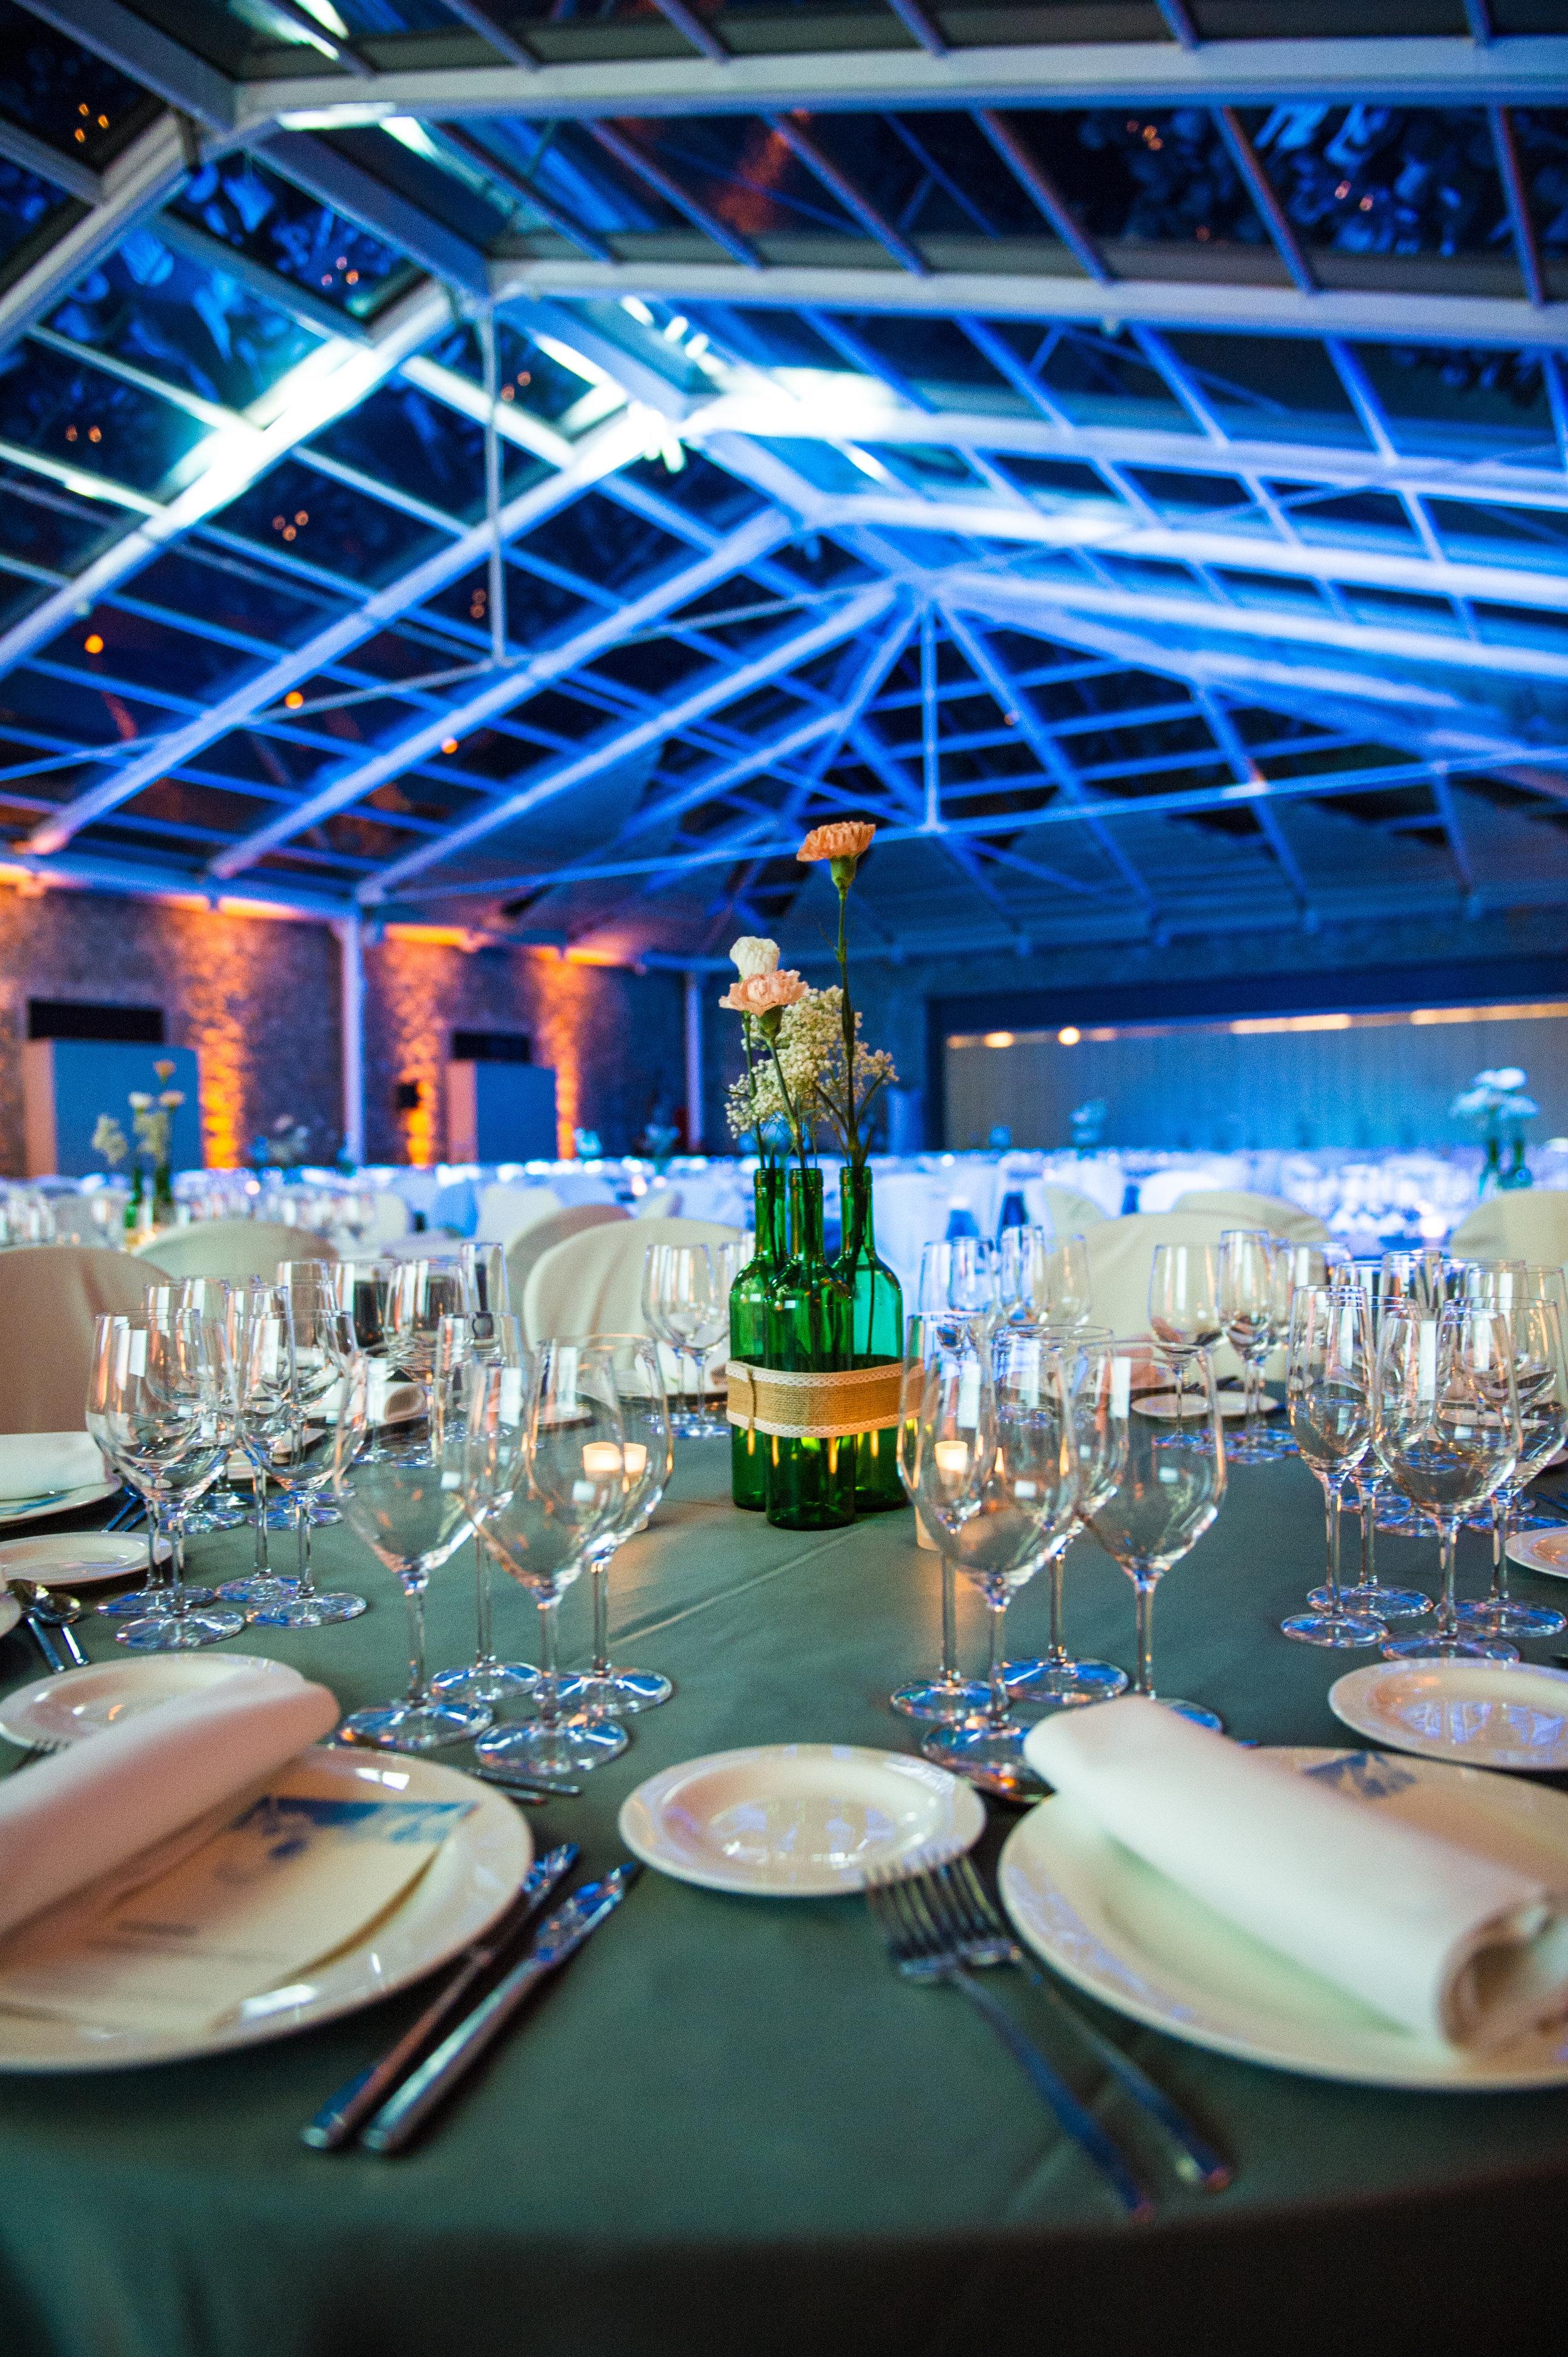 converted-vineyard-themed-table-centres.jpg